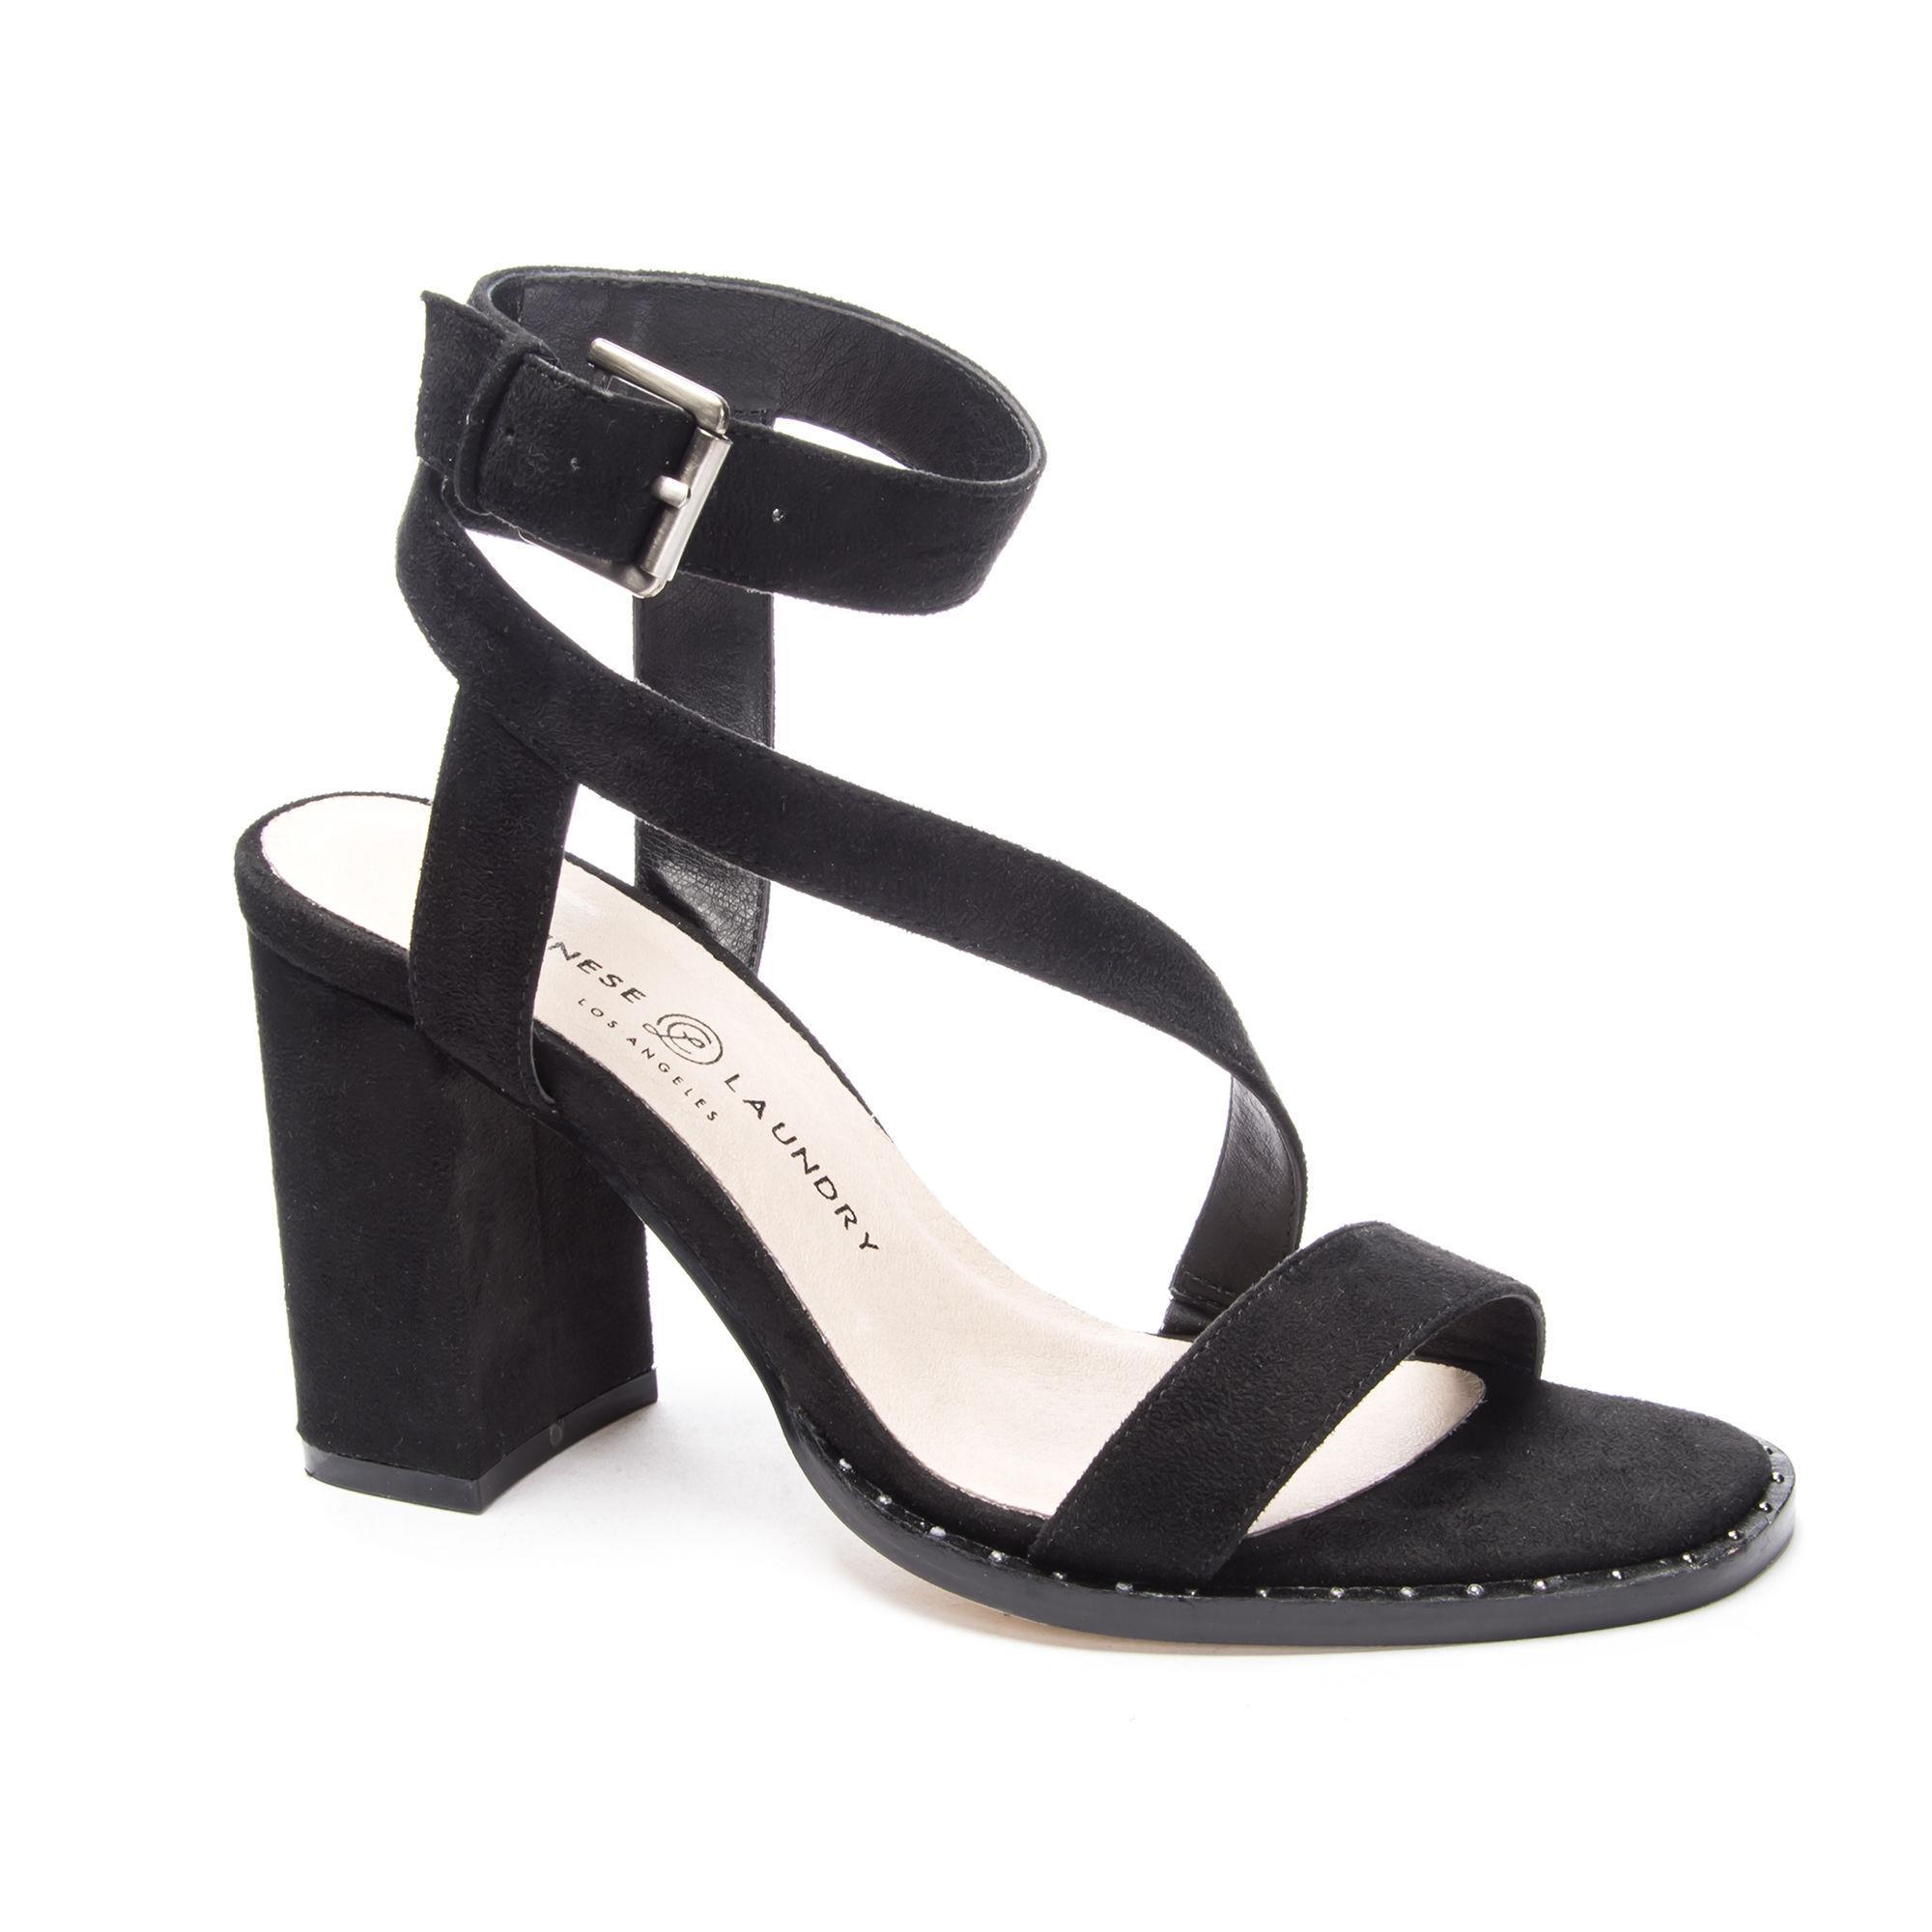 b390e46cf9a7 Lyst - Chinese Laundry Simi Block Heel Sandal in Black